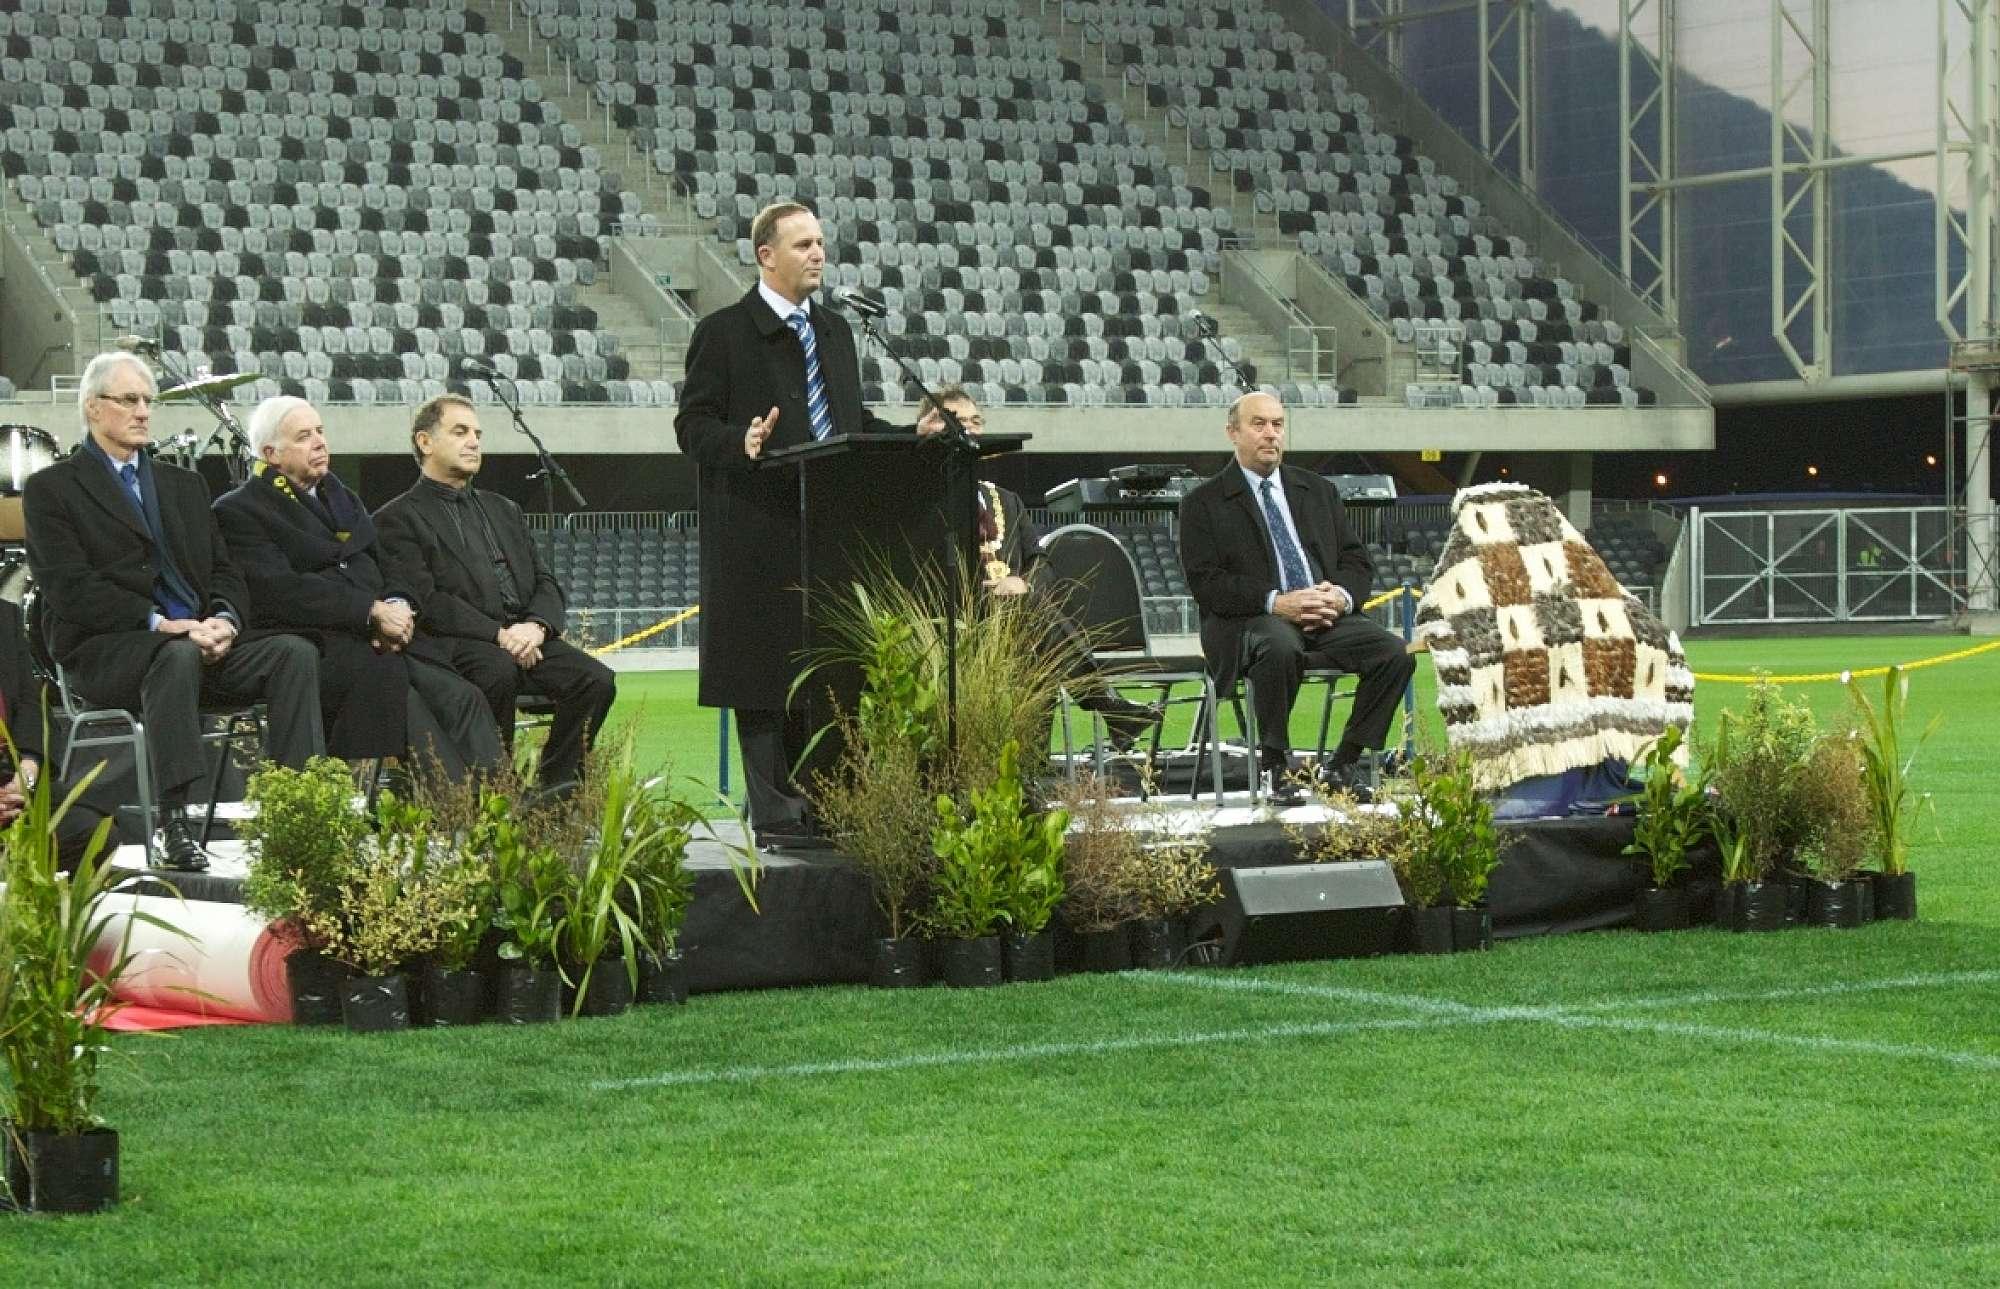 Forsyth Barr Stadium opening ceremony